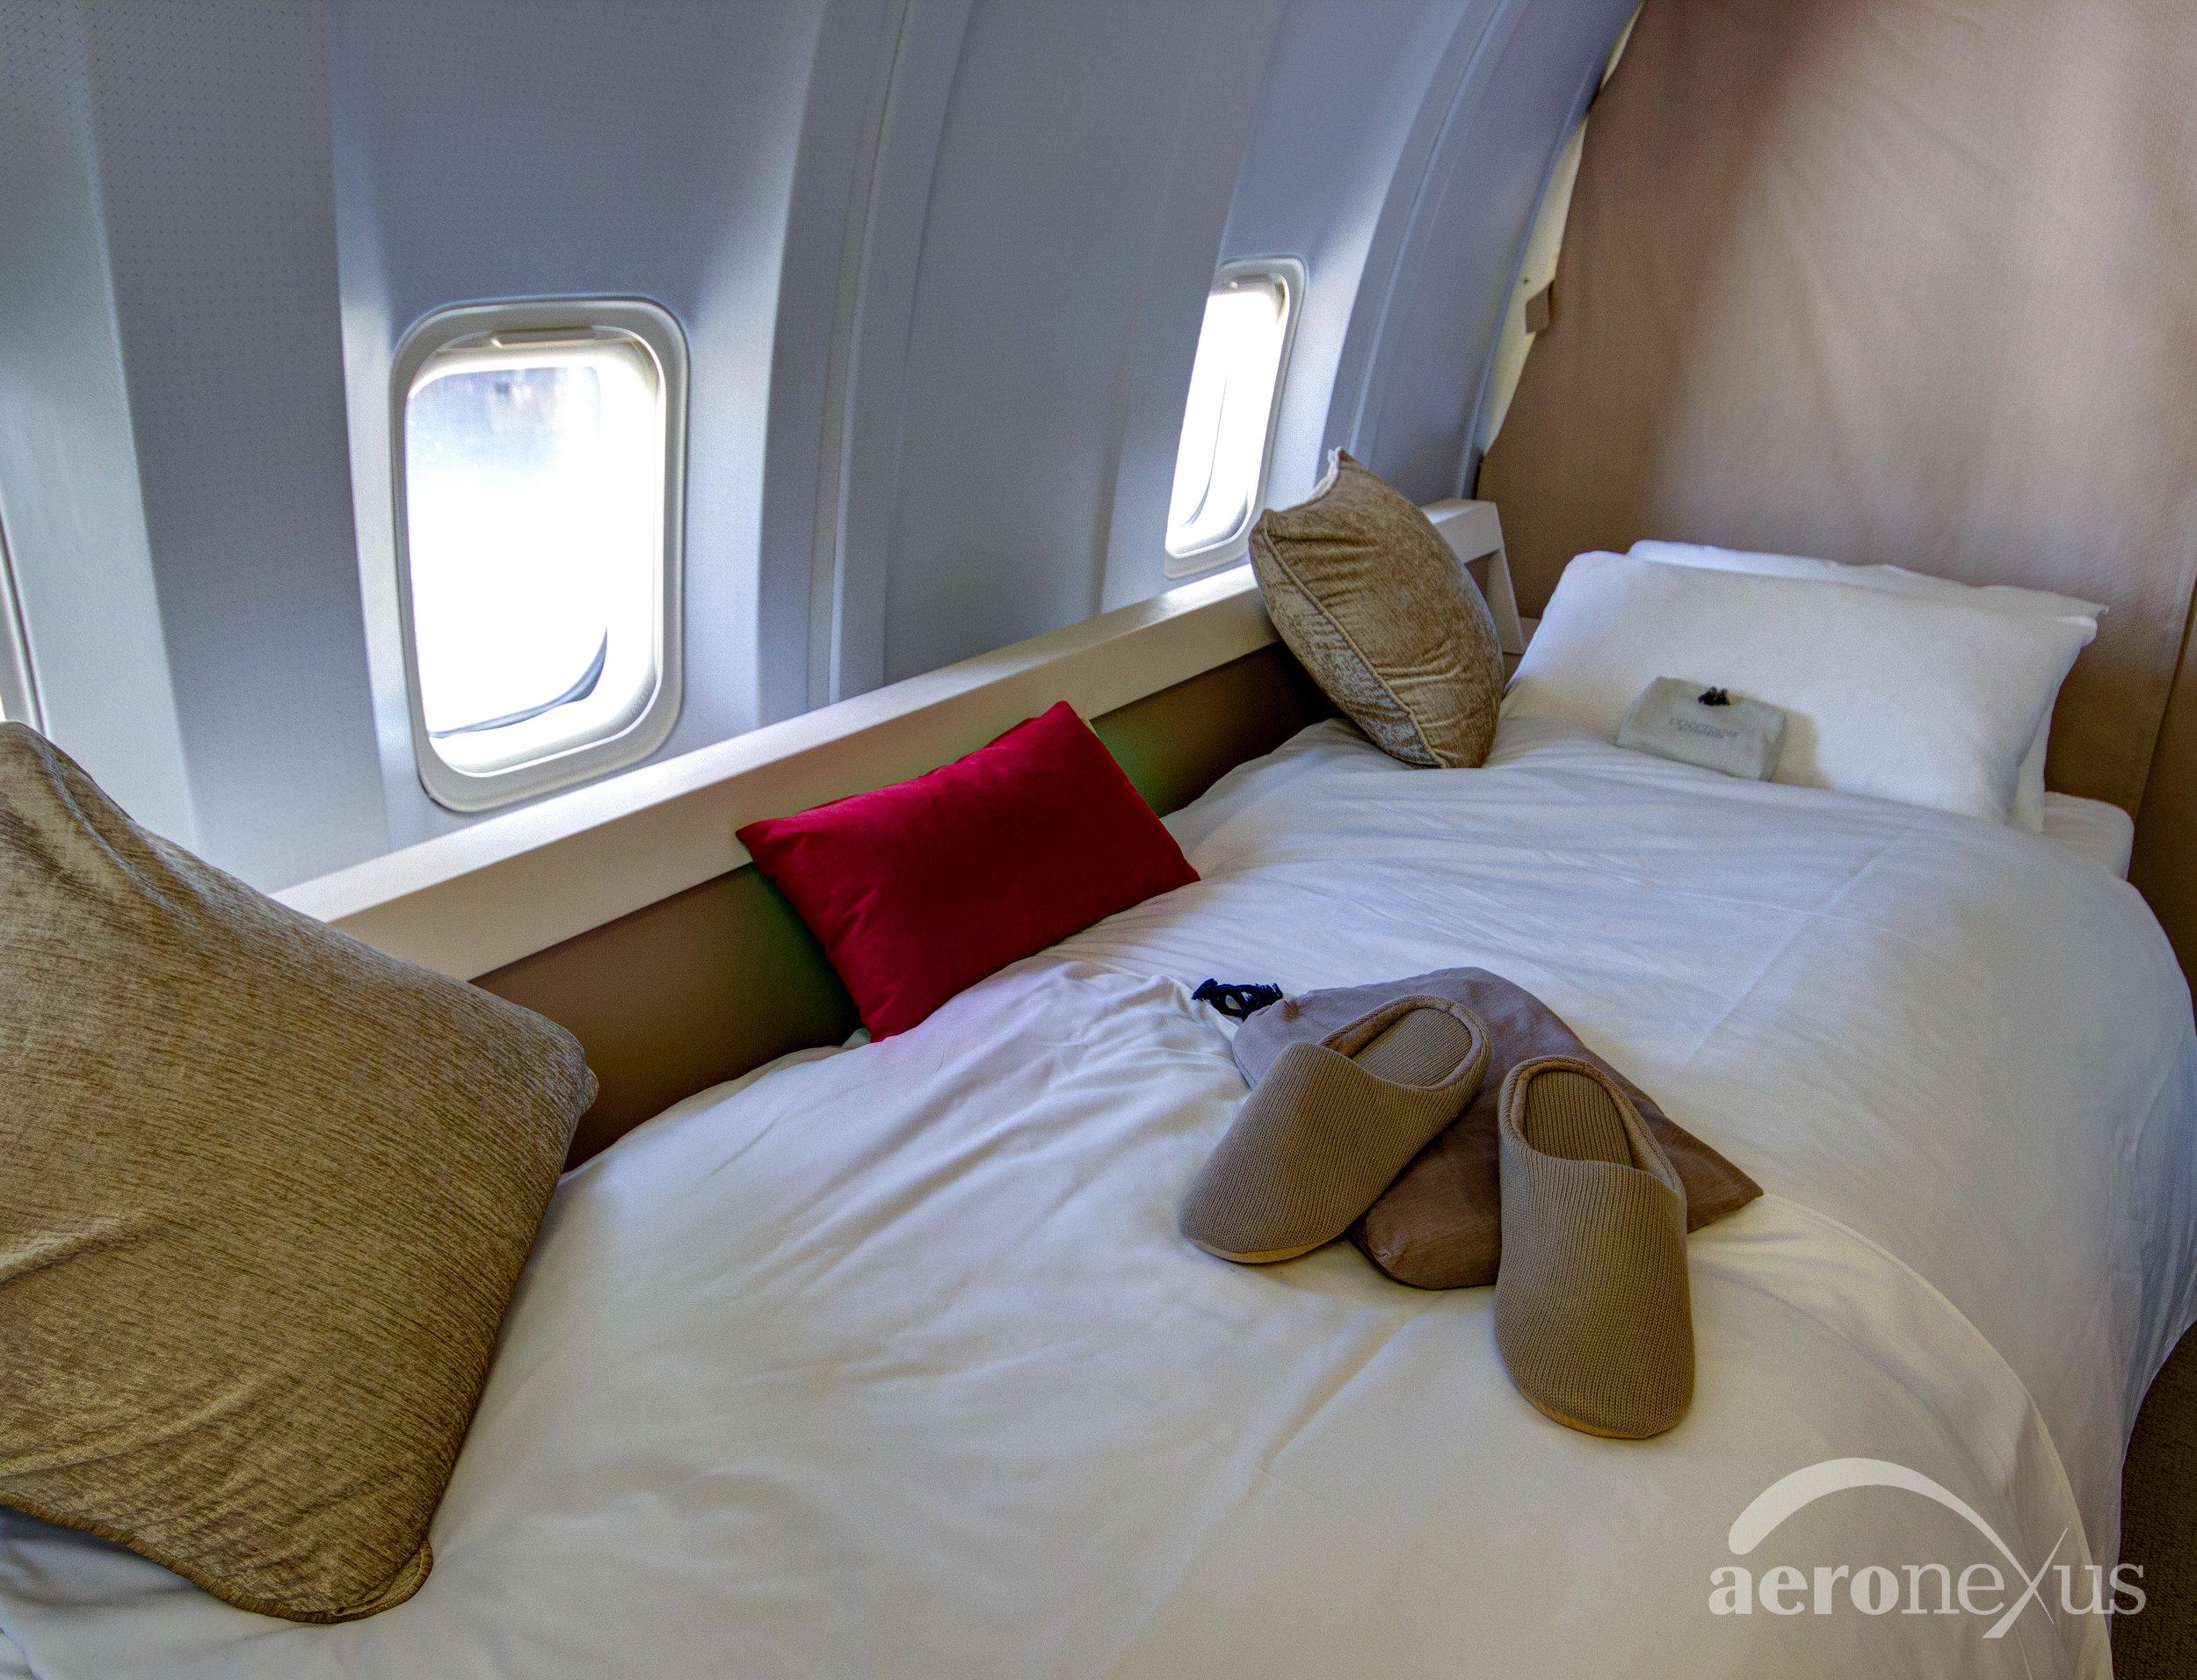 Aeronexus | VIP Boeing 767-300ER | Interior Bed